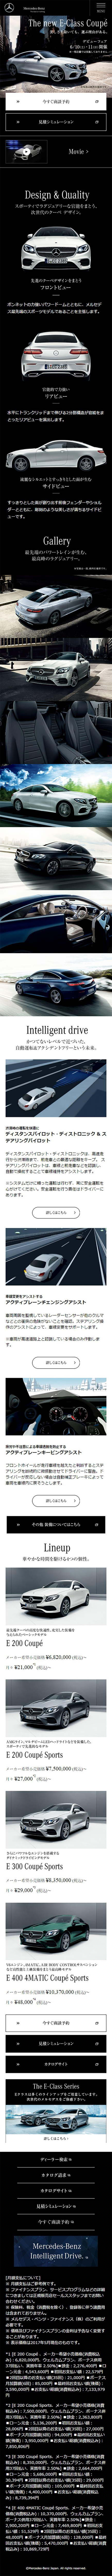 The new E-Class Coupe|WEBデザイナーさん必見!スマホランディングページのデザイン参考に(信頼・安心系)